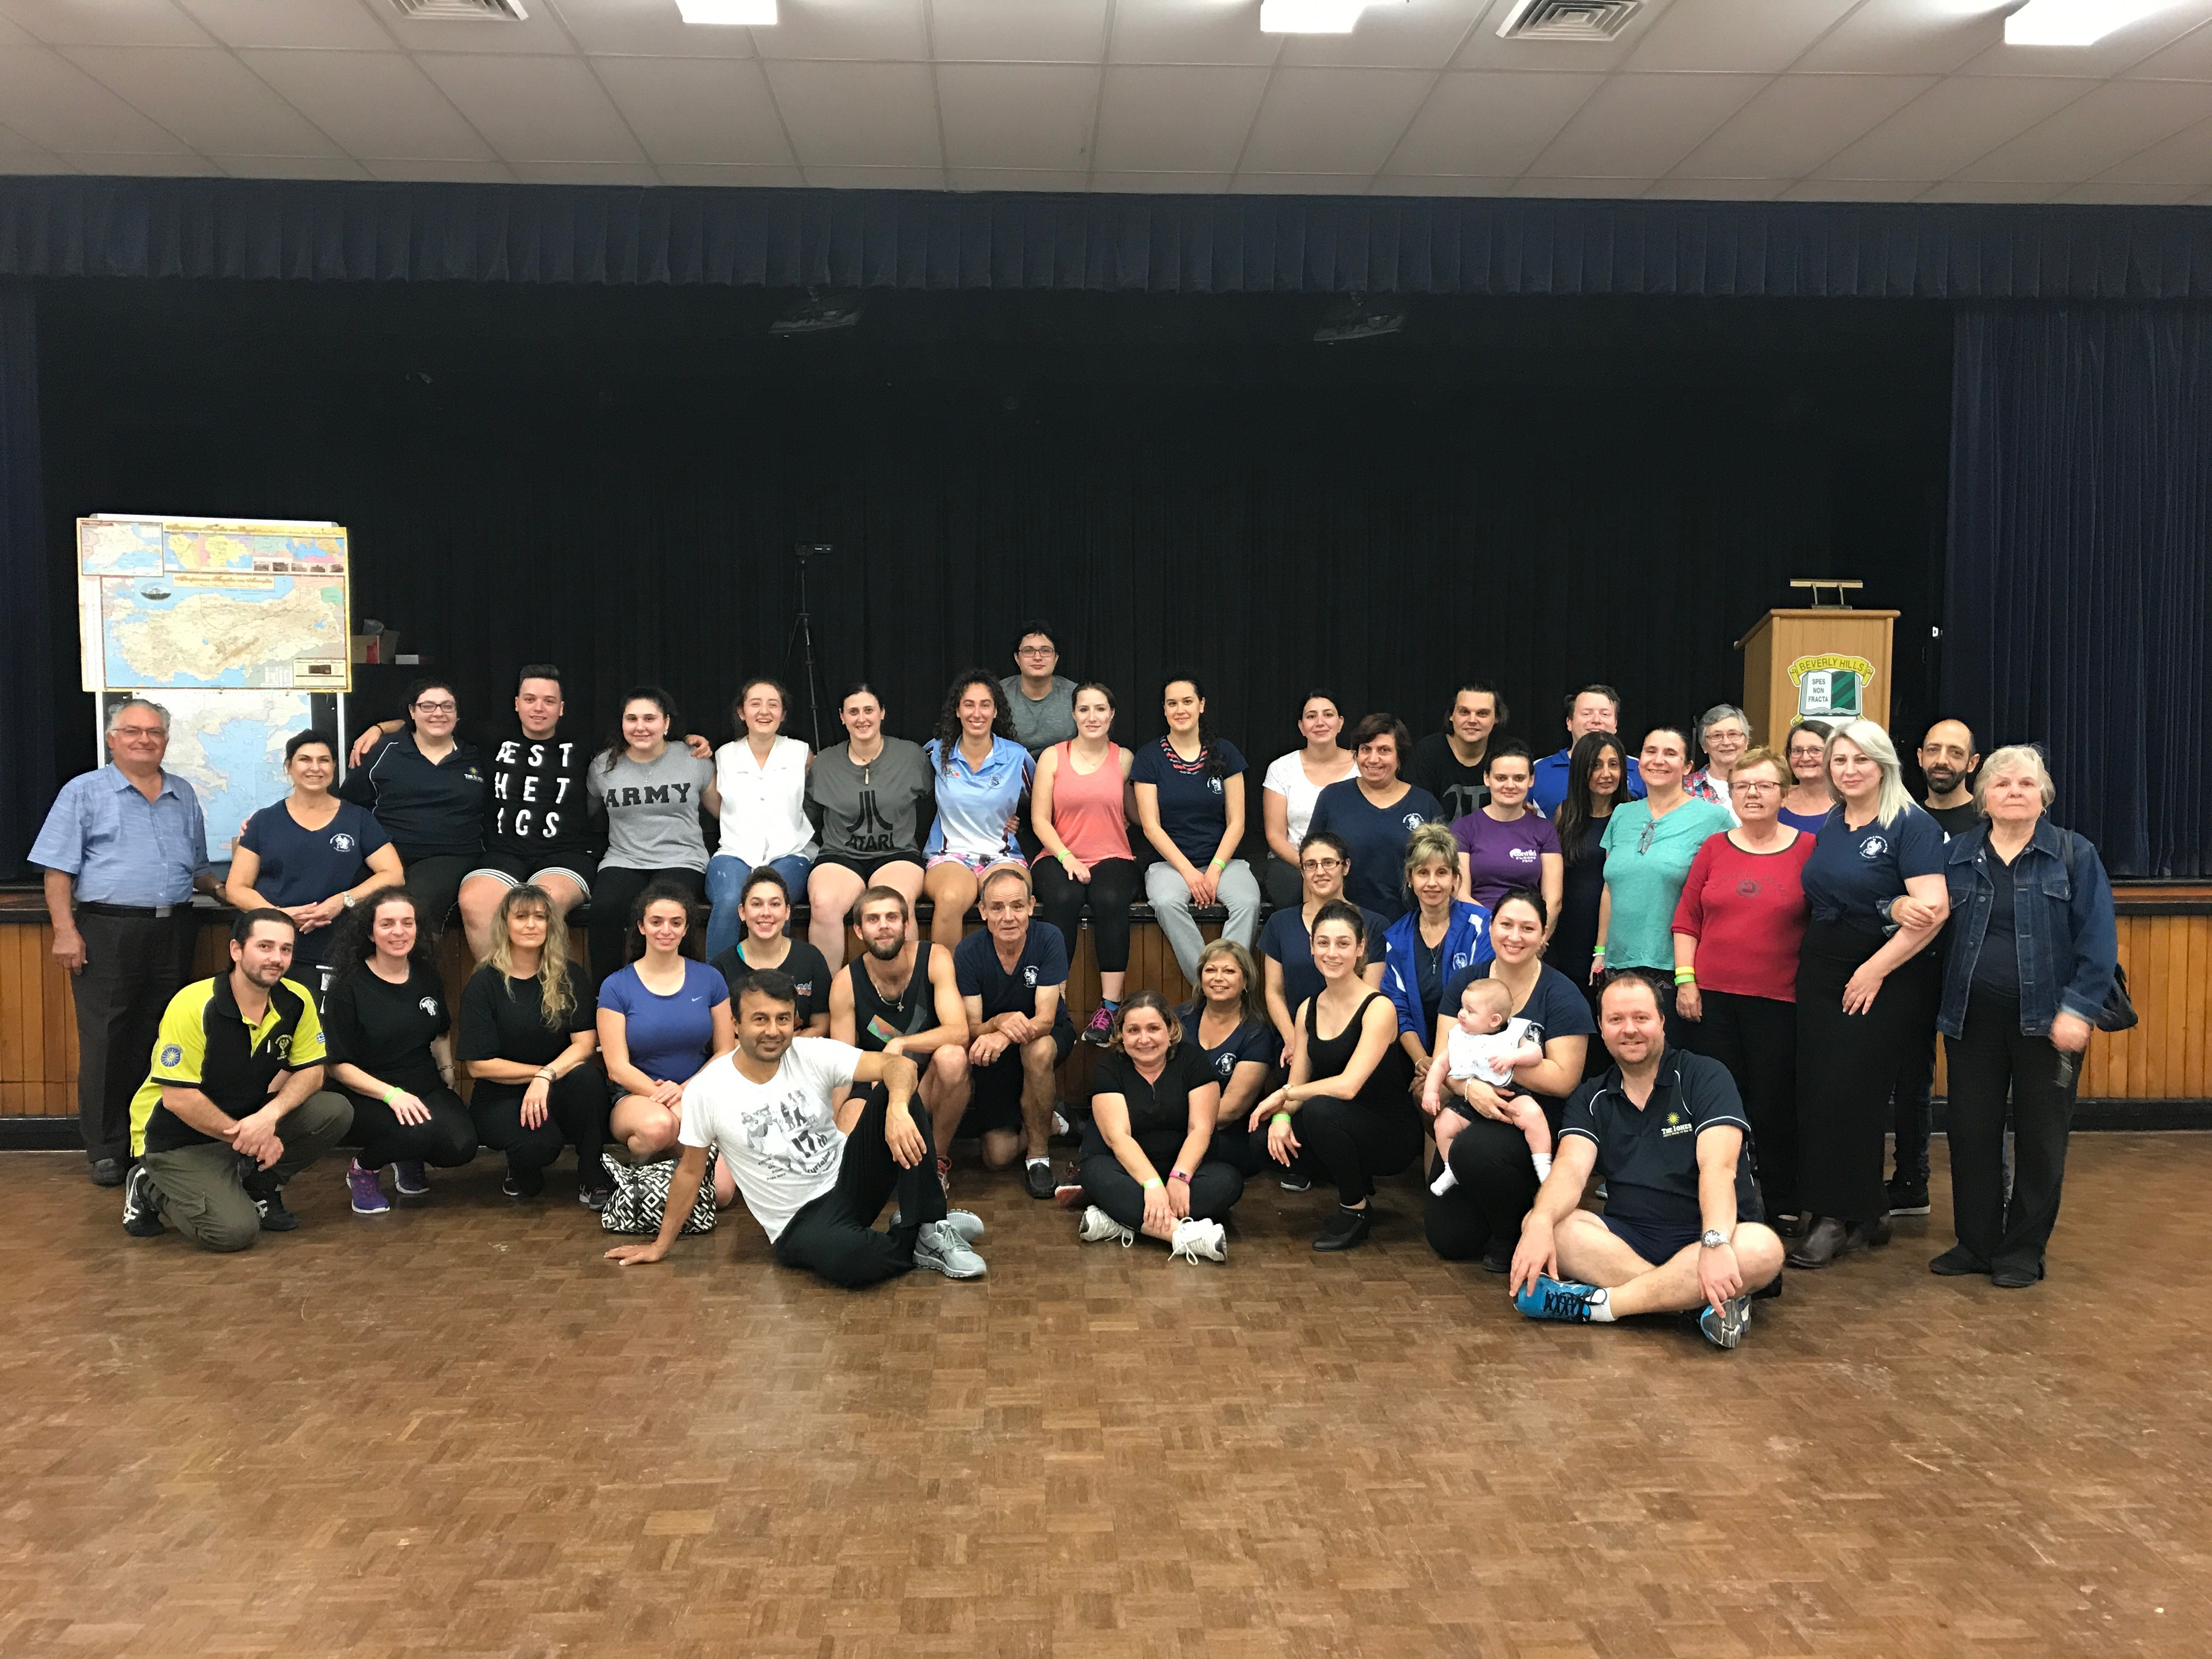 Sunday 23rd Dancers Vimata 2017